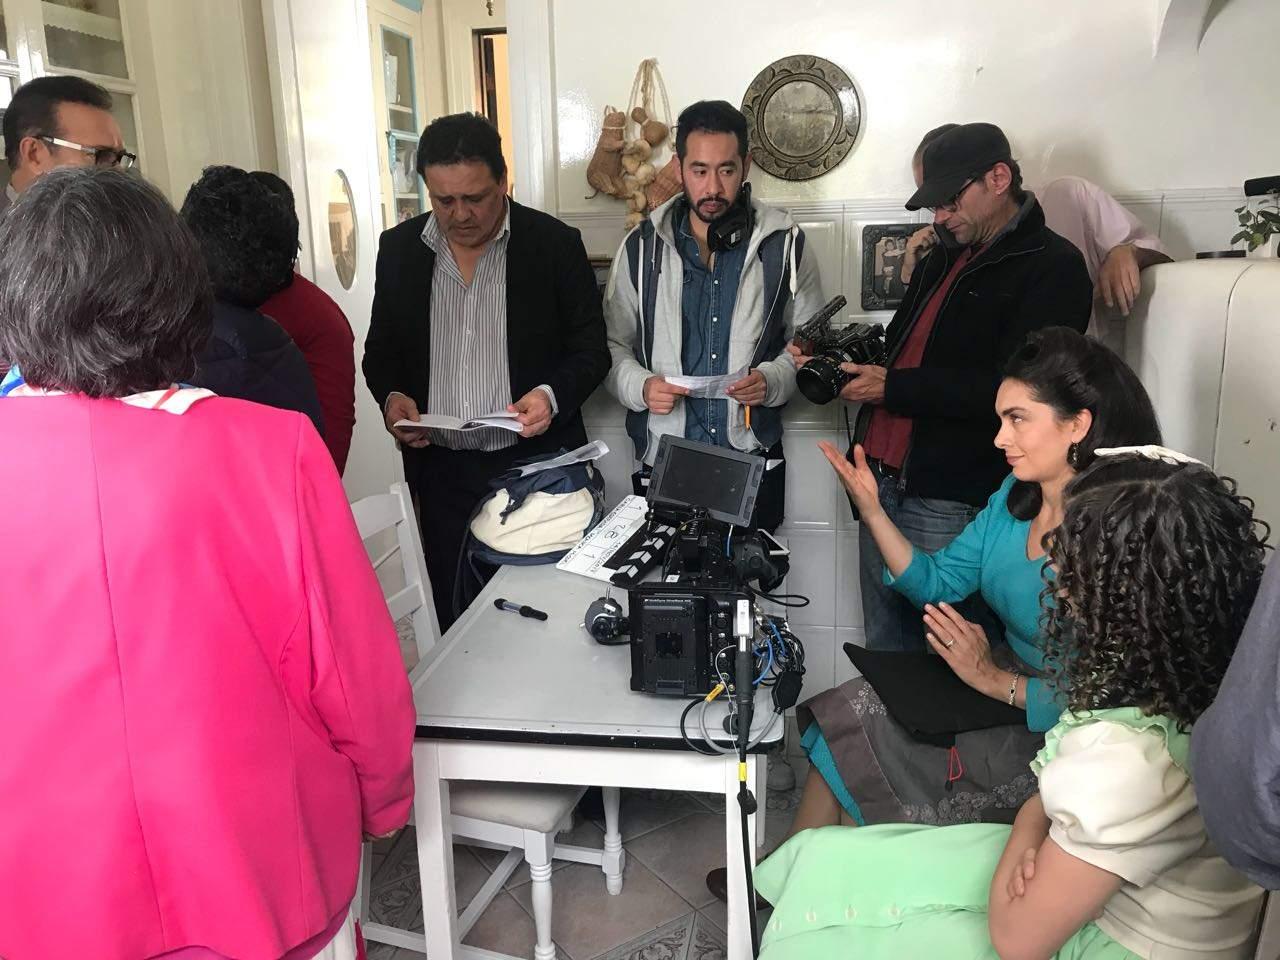 Bioserie de Silvia Pinal inicia grabaciones